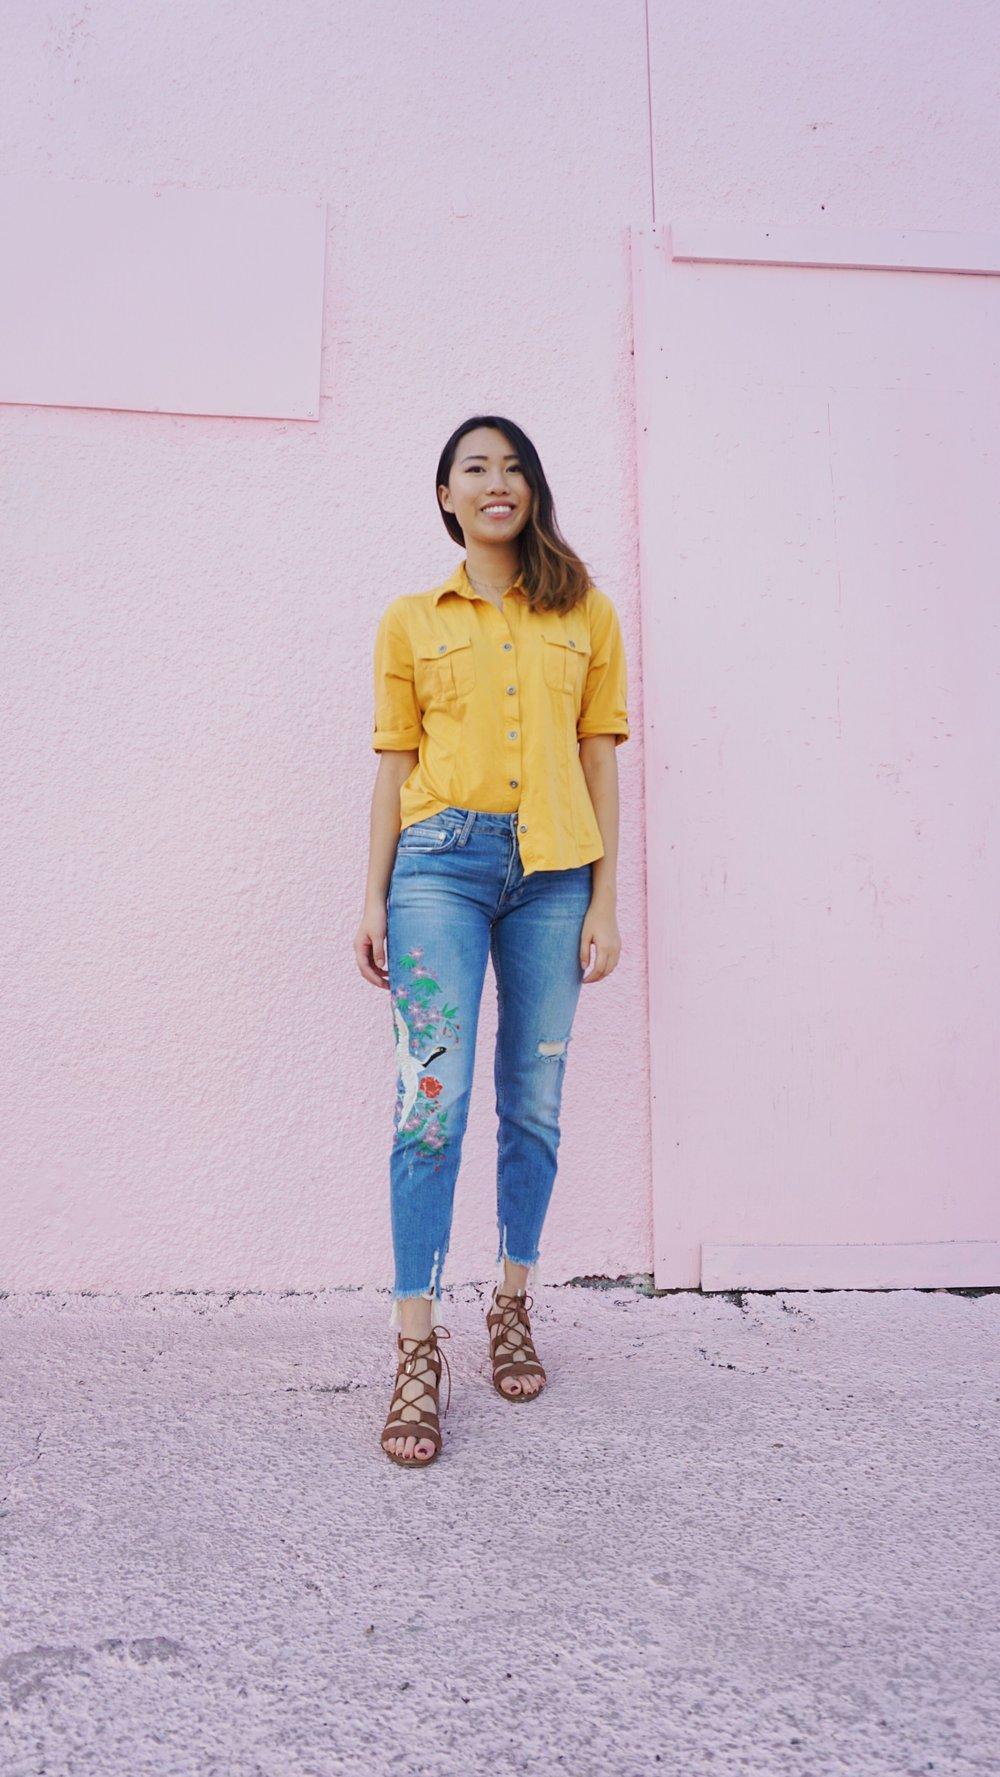 Jeans: Zara Denim, Shoes: Call it Spring